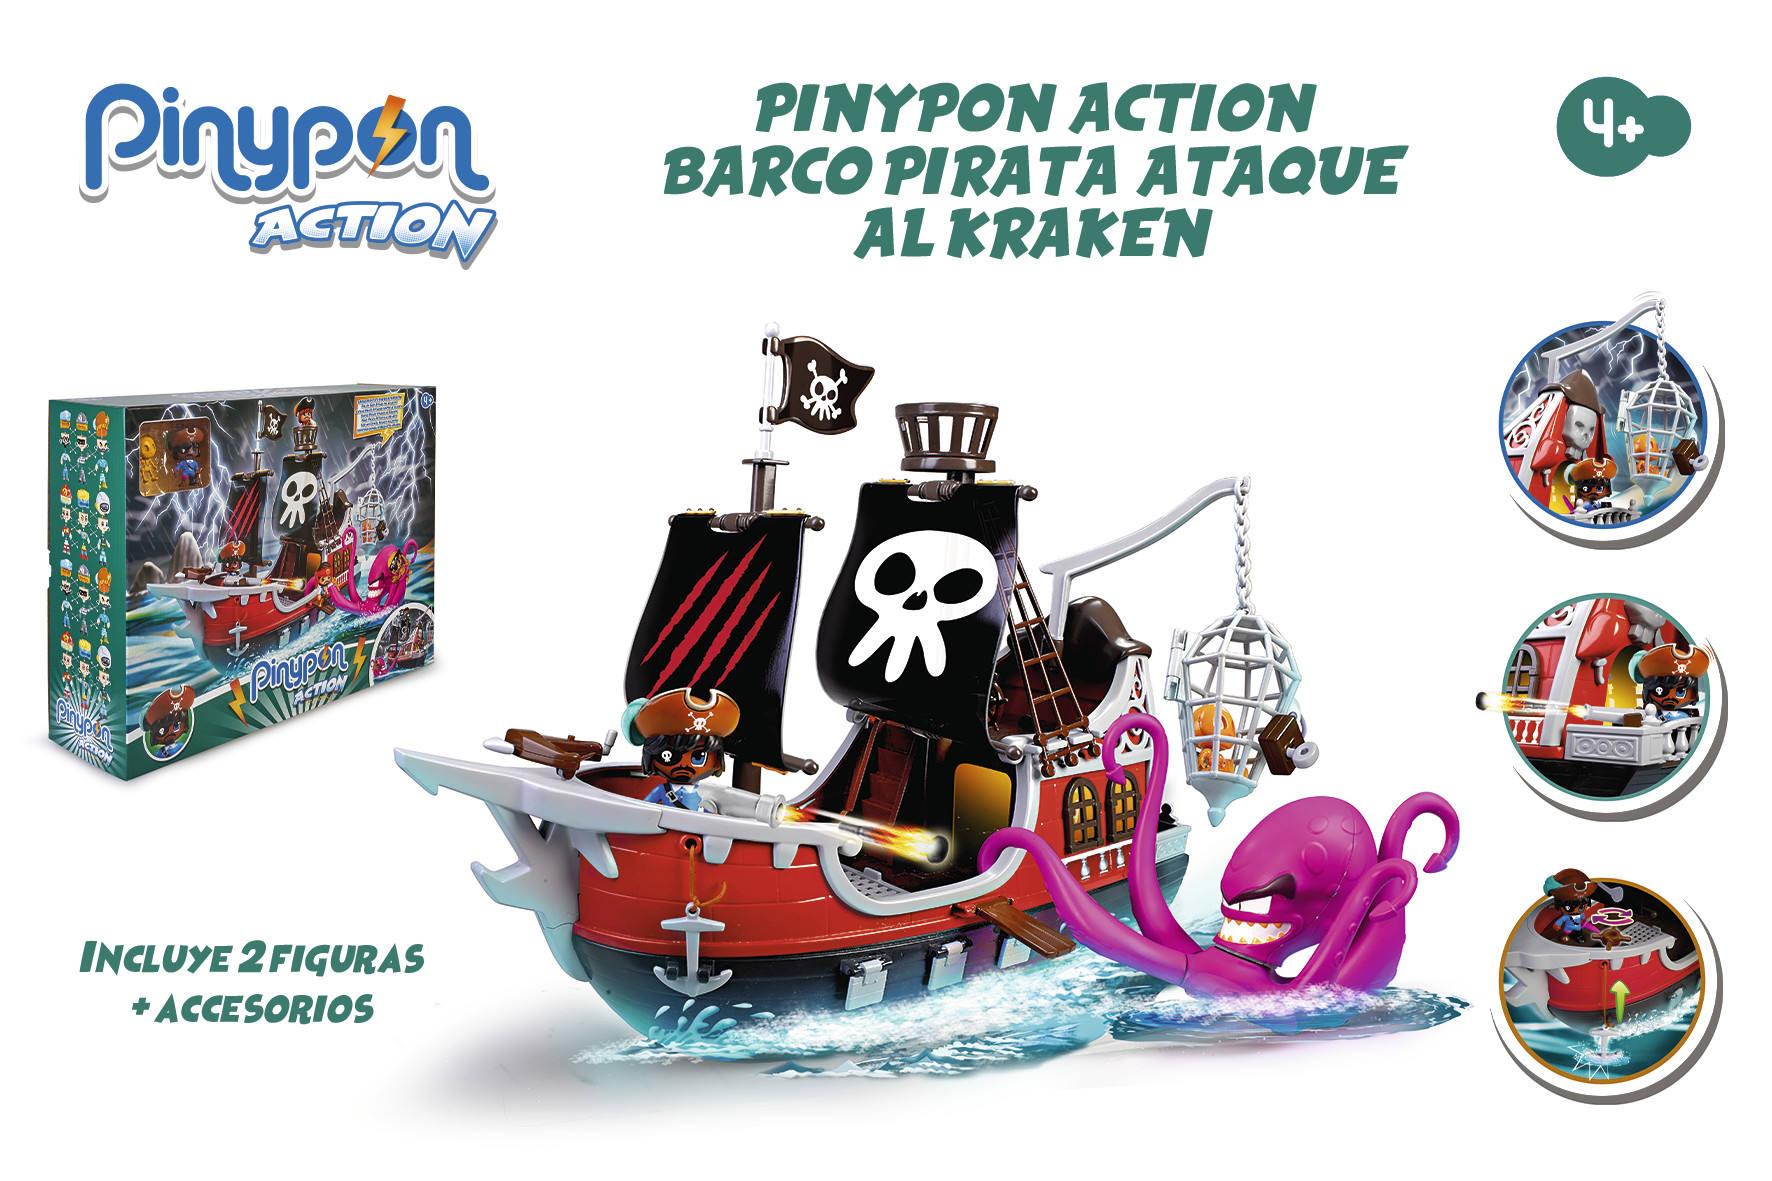 PINYPON ACTION BARCO PIRATA 15803 - N39820